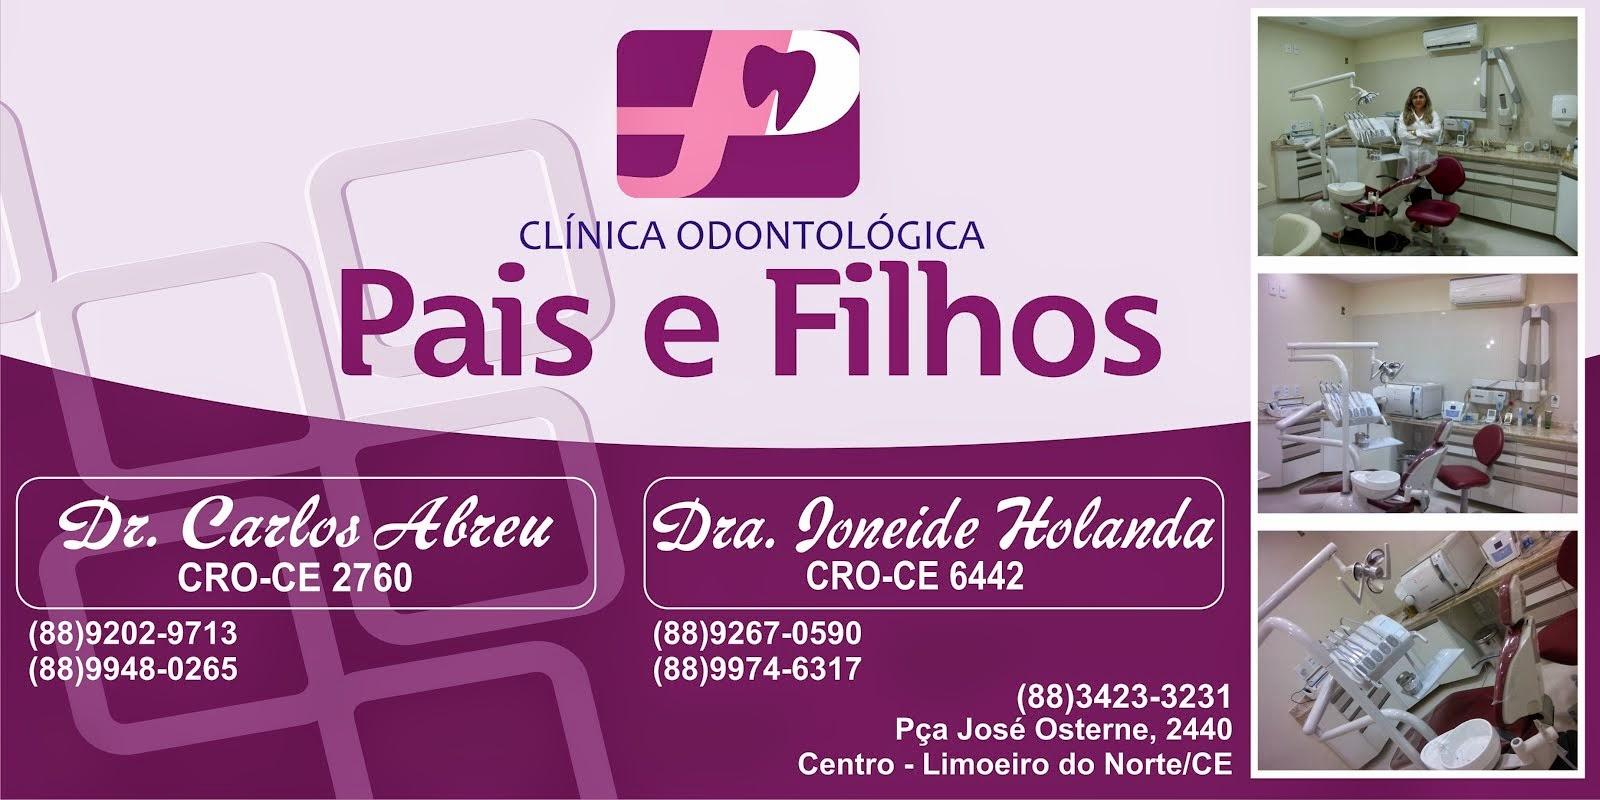 CLÍNICA ODONTOLÓGICA PAIS E FILHOS